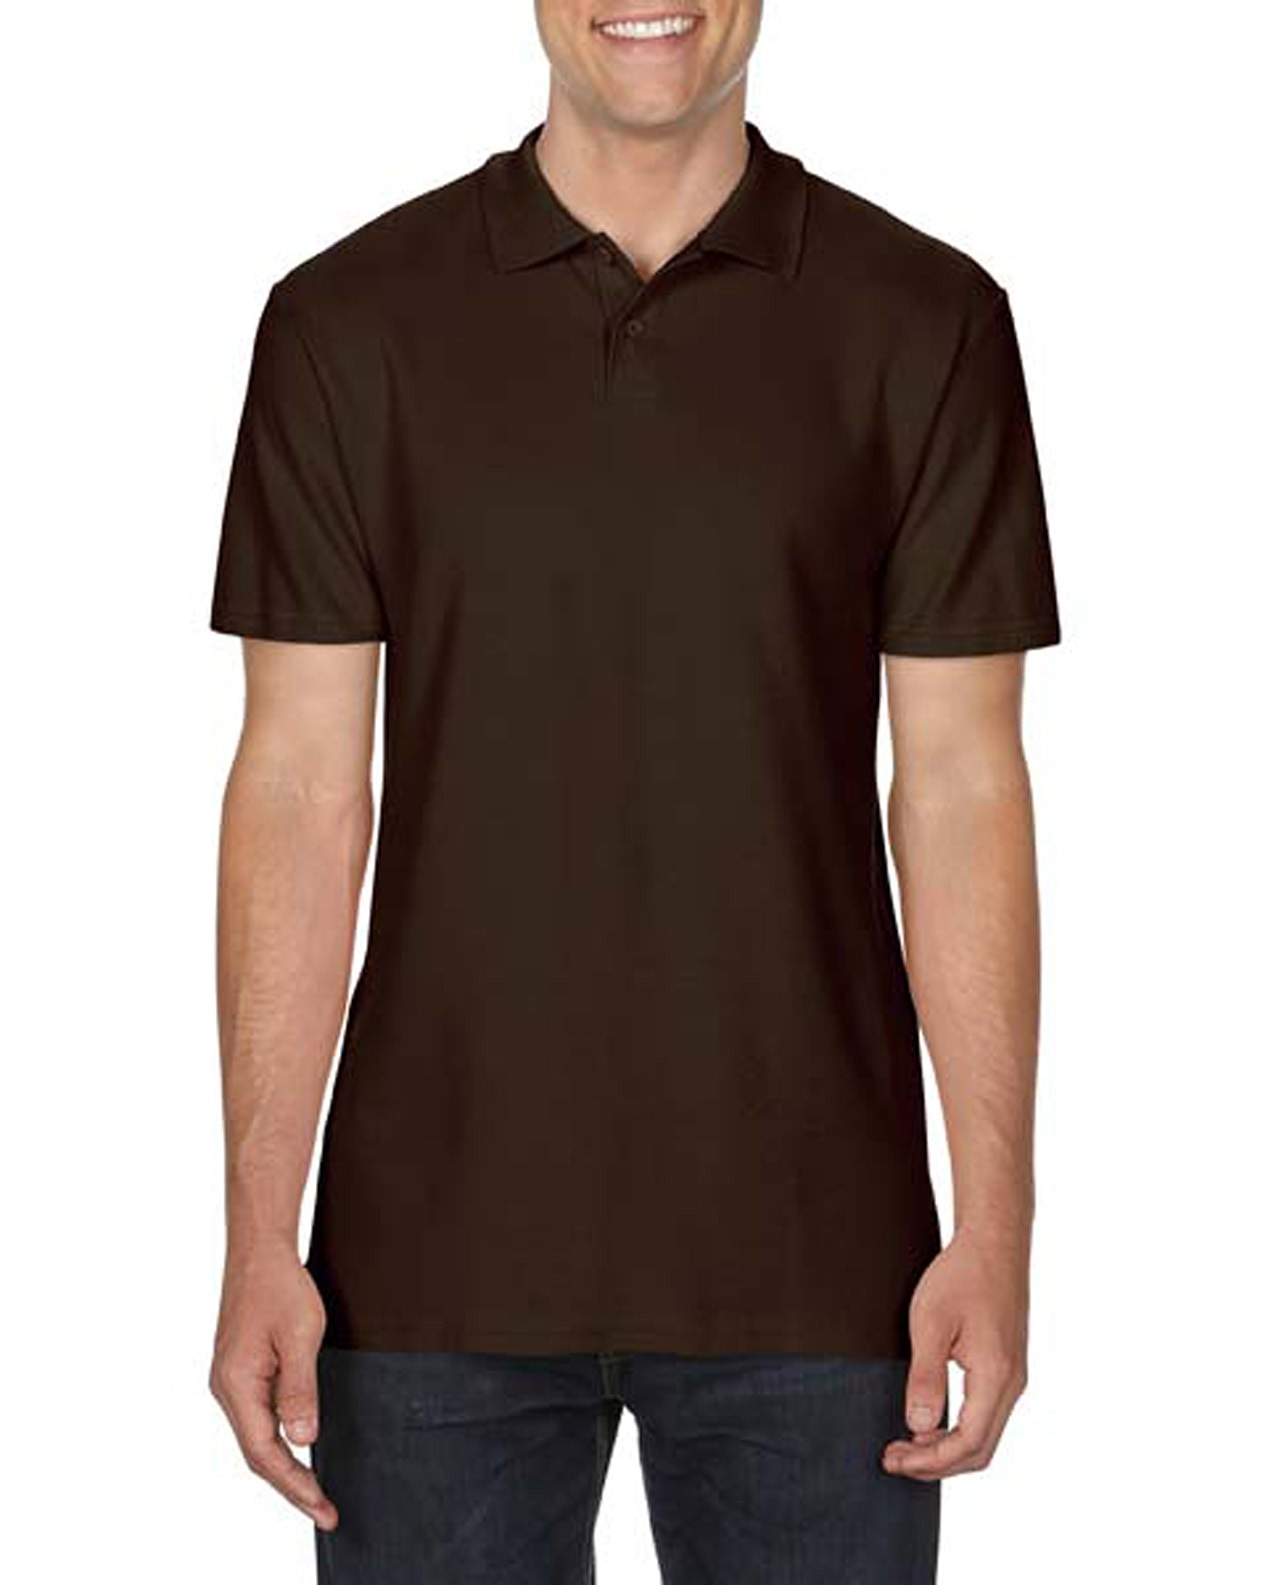 100 cotton Gildan polo shirt dark choc